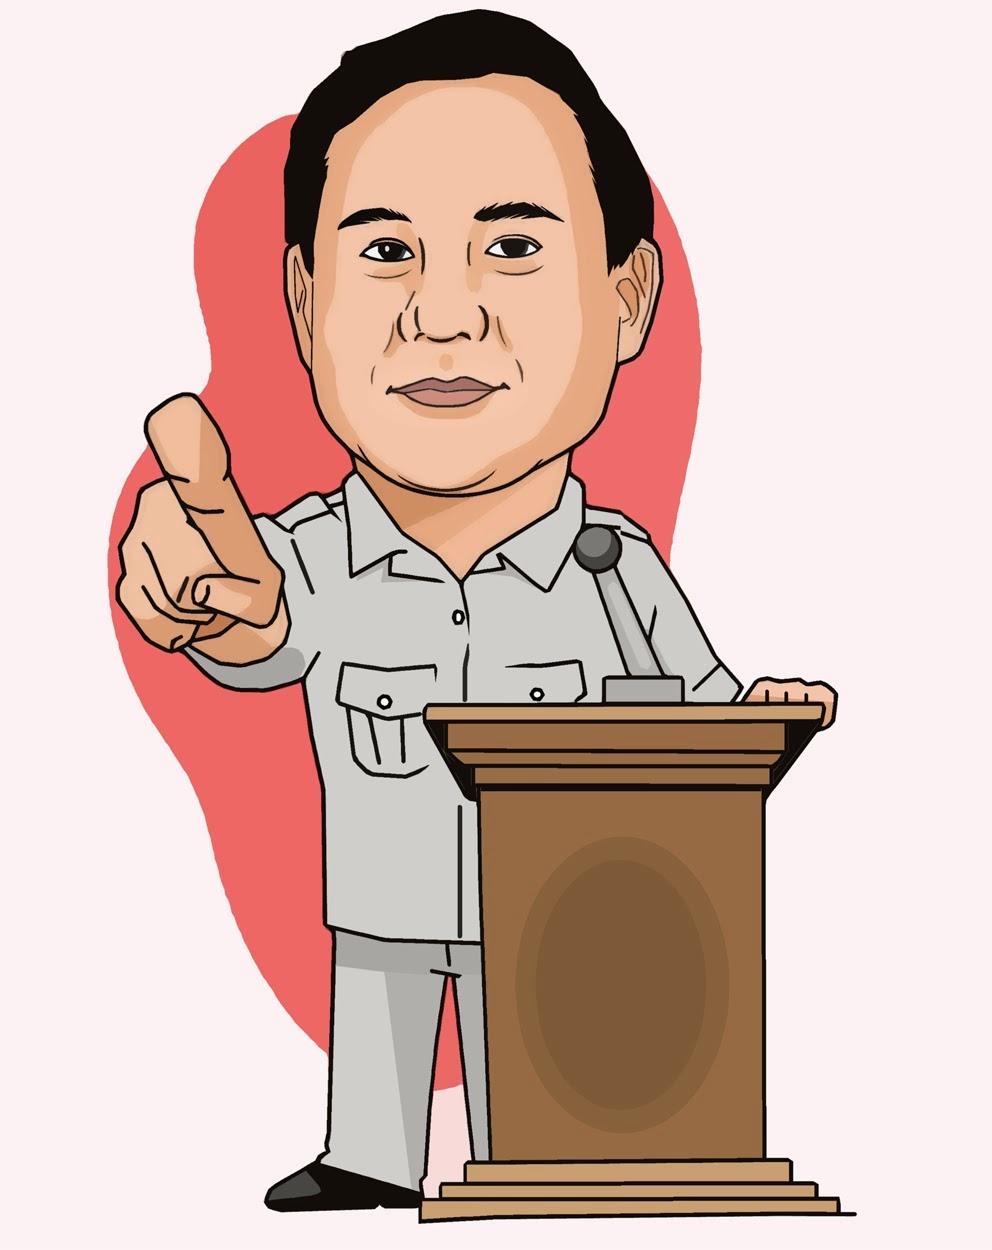 Gambar Kartun Prabowo Subianto Karikatur Calon Presiden RI 2014